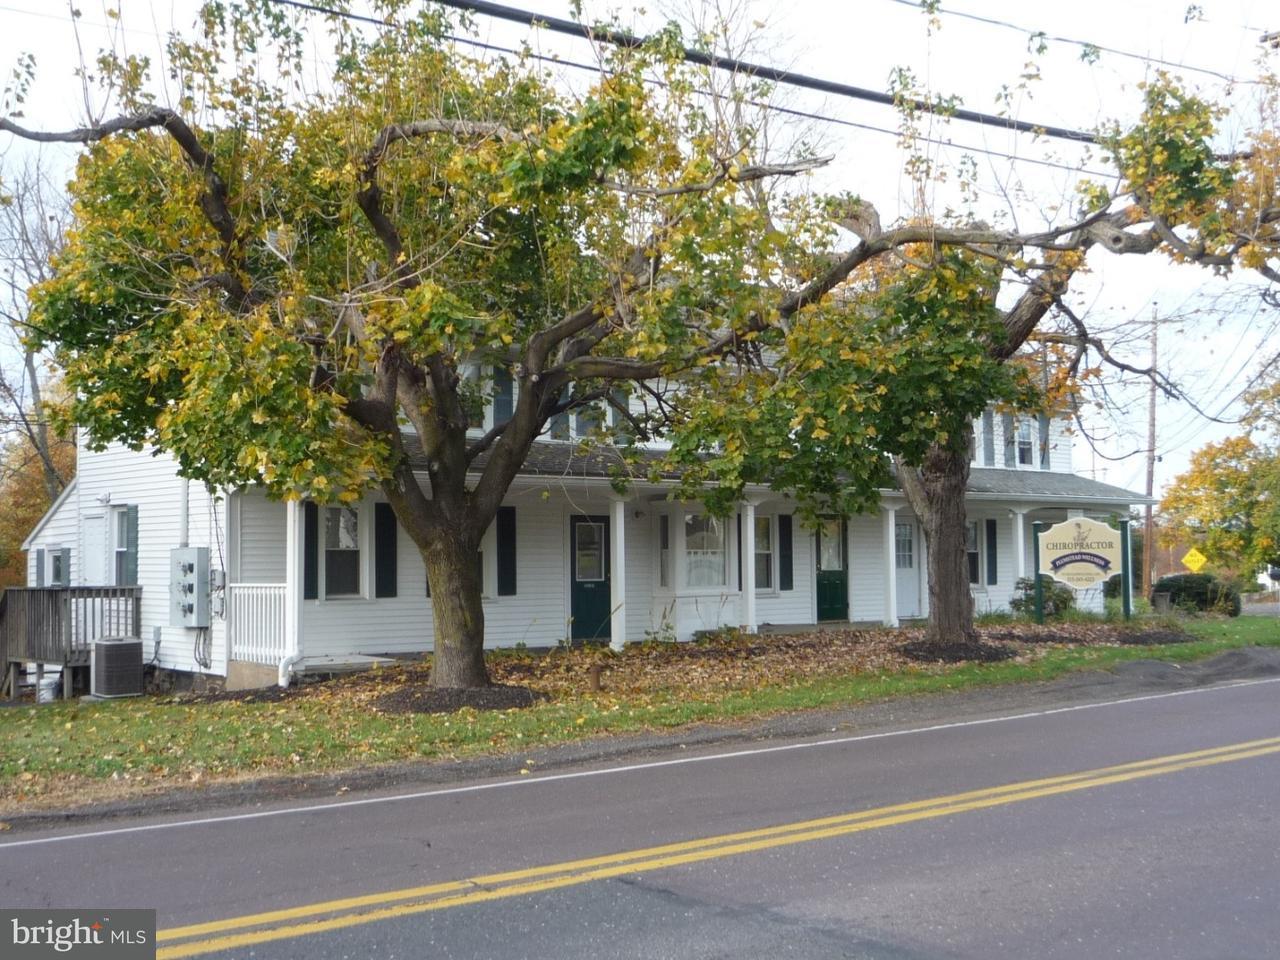 4295 POINT PLEASANT PIKE #2ND FL  Danboro, Pennsylvania 18916 United States